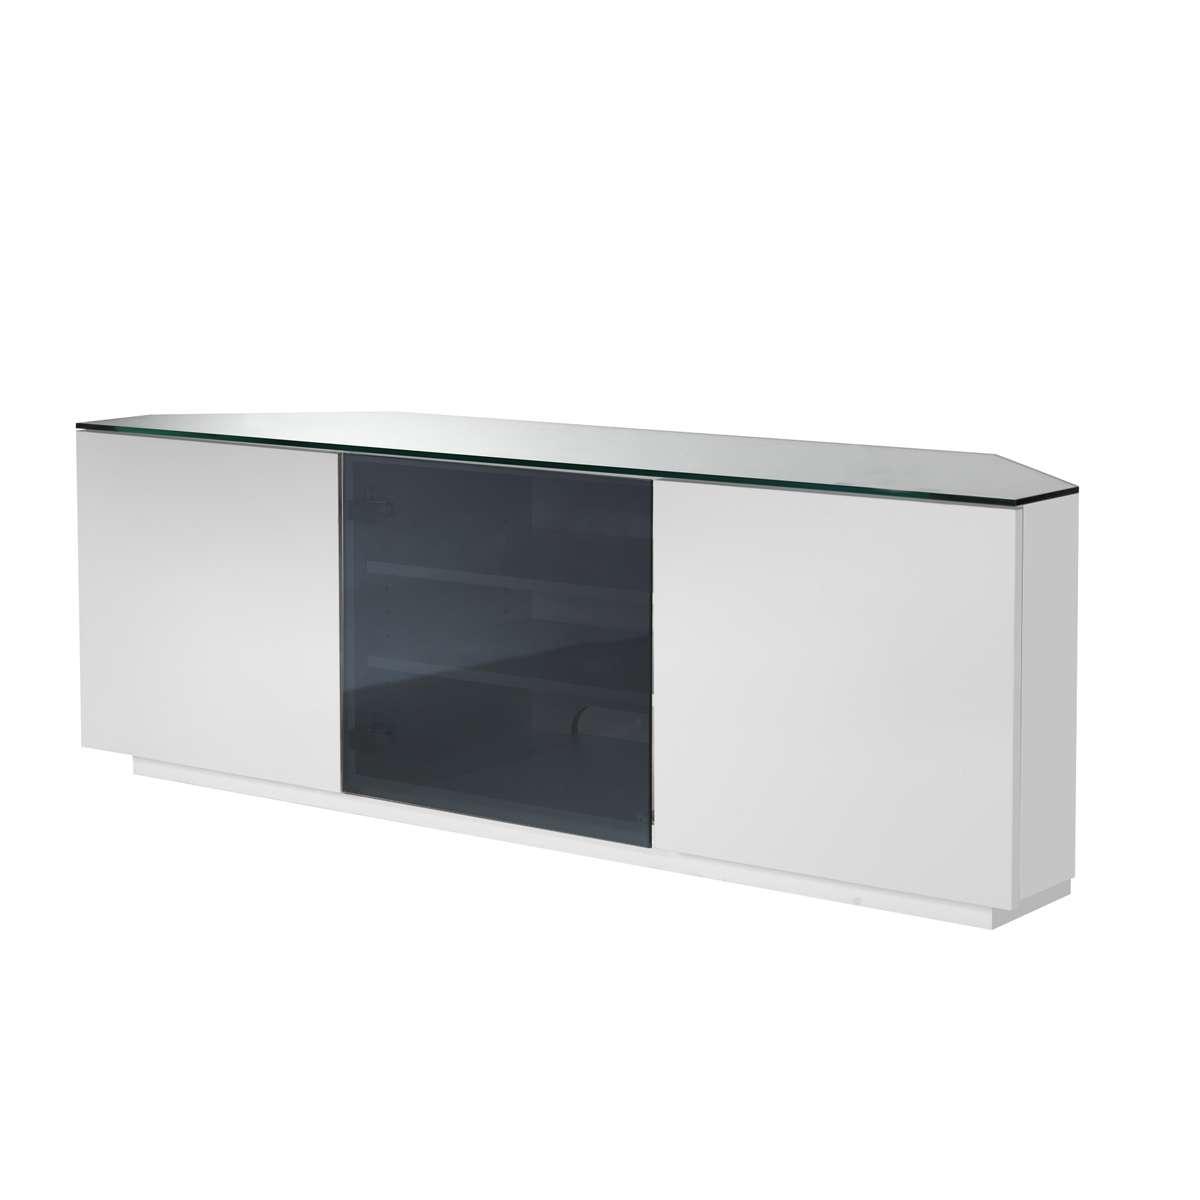 Ukcf Milan White Gloss & Black Glass Corner Tv Stand 150cm Throughout White High Gloss Corner Tv Stands (View 5 of 20)